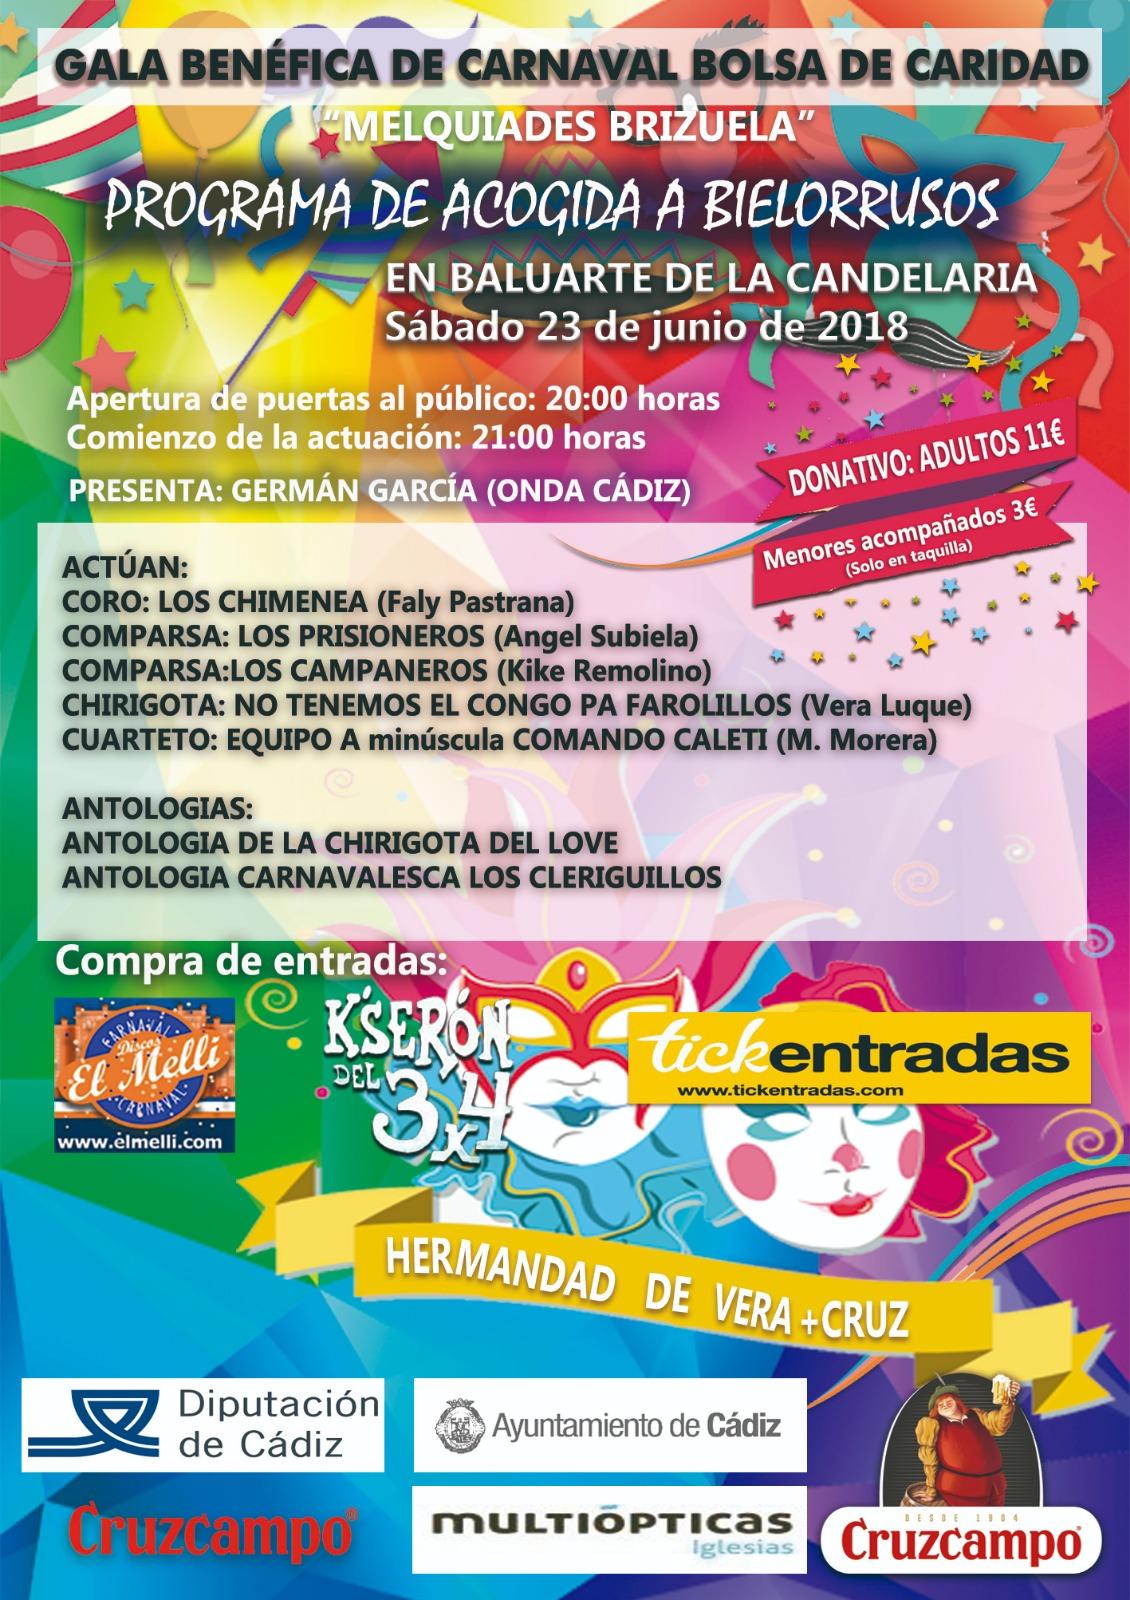 Gala Benéfica de Carnaval. 23 de junio